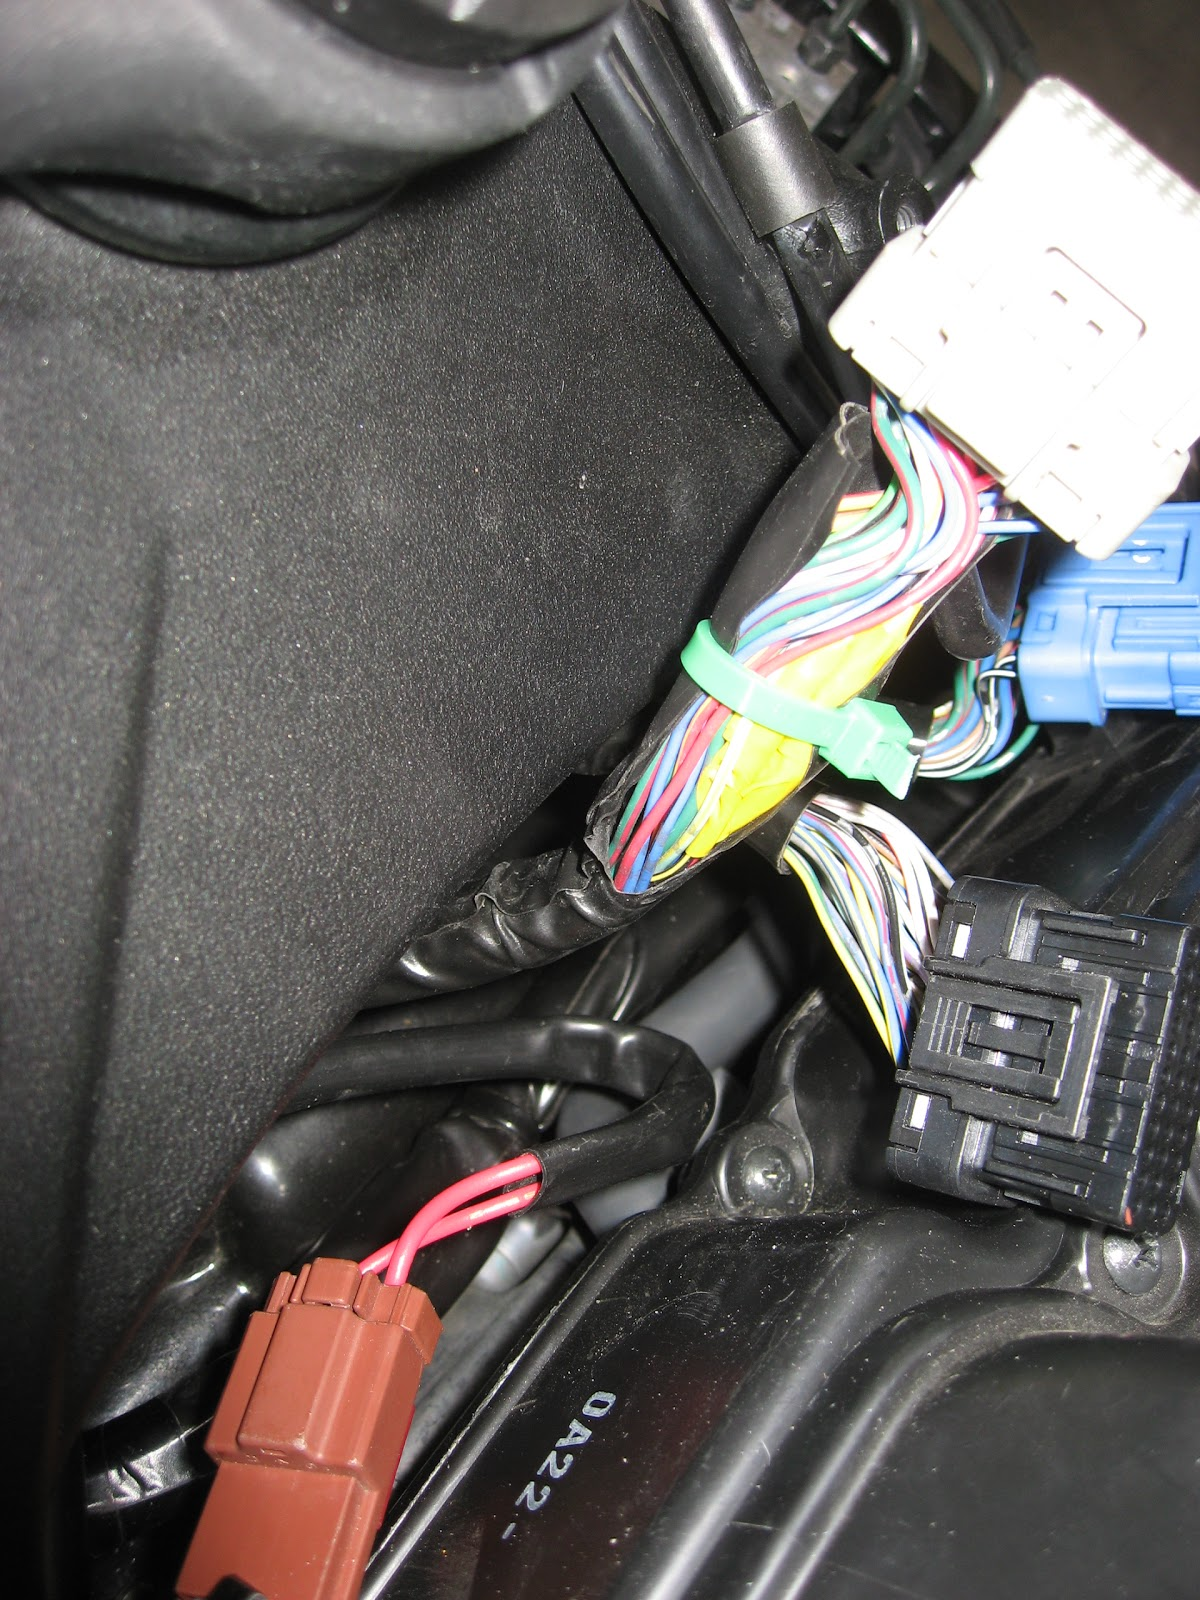 Honda Vfr1200f Weblog  Switchable Power Modes